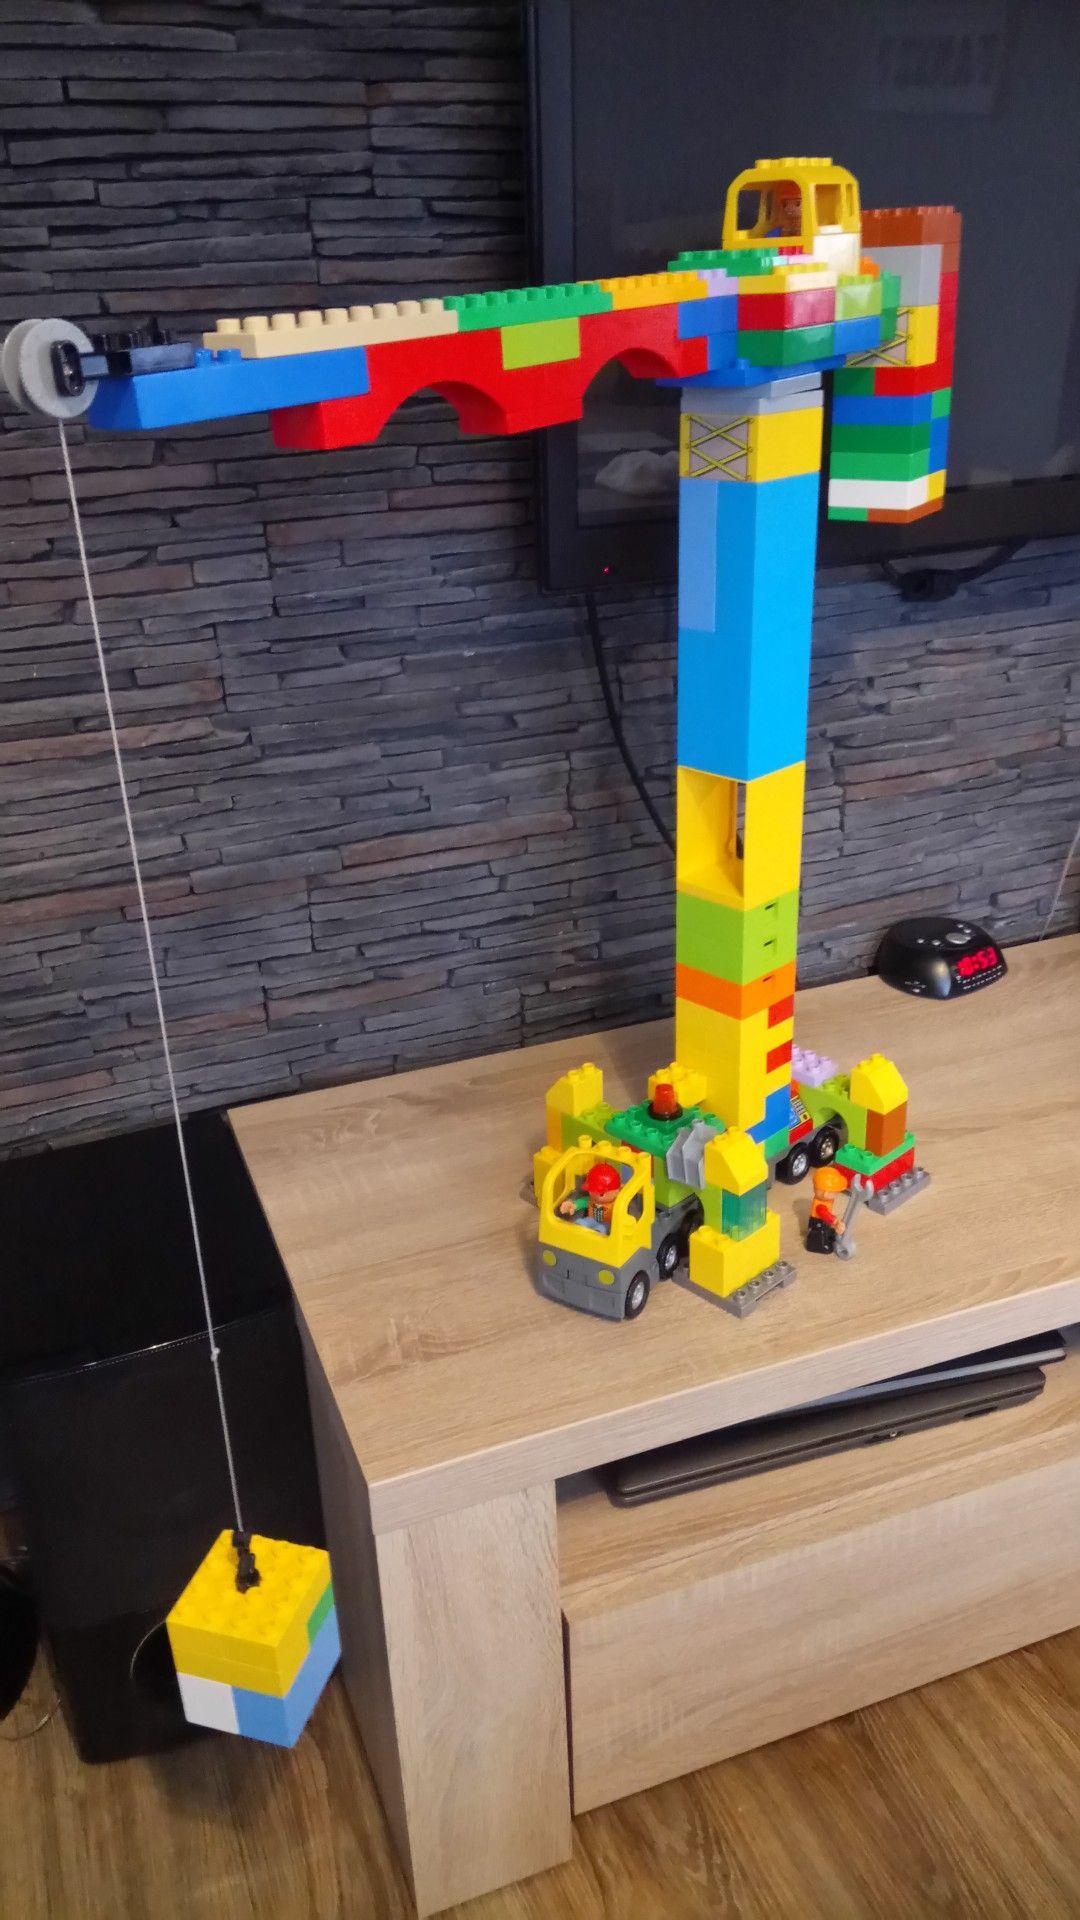 Kids Lego 4Legos Crane Duplo DuploFor uFJ5lK31Tc